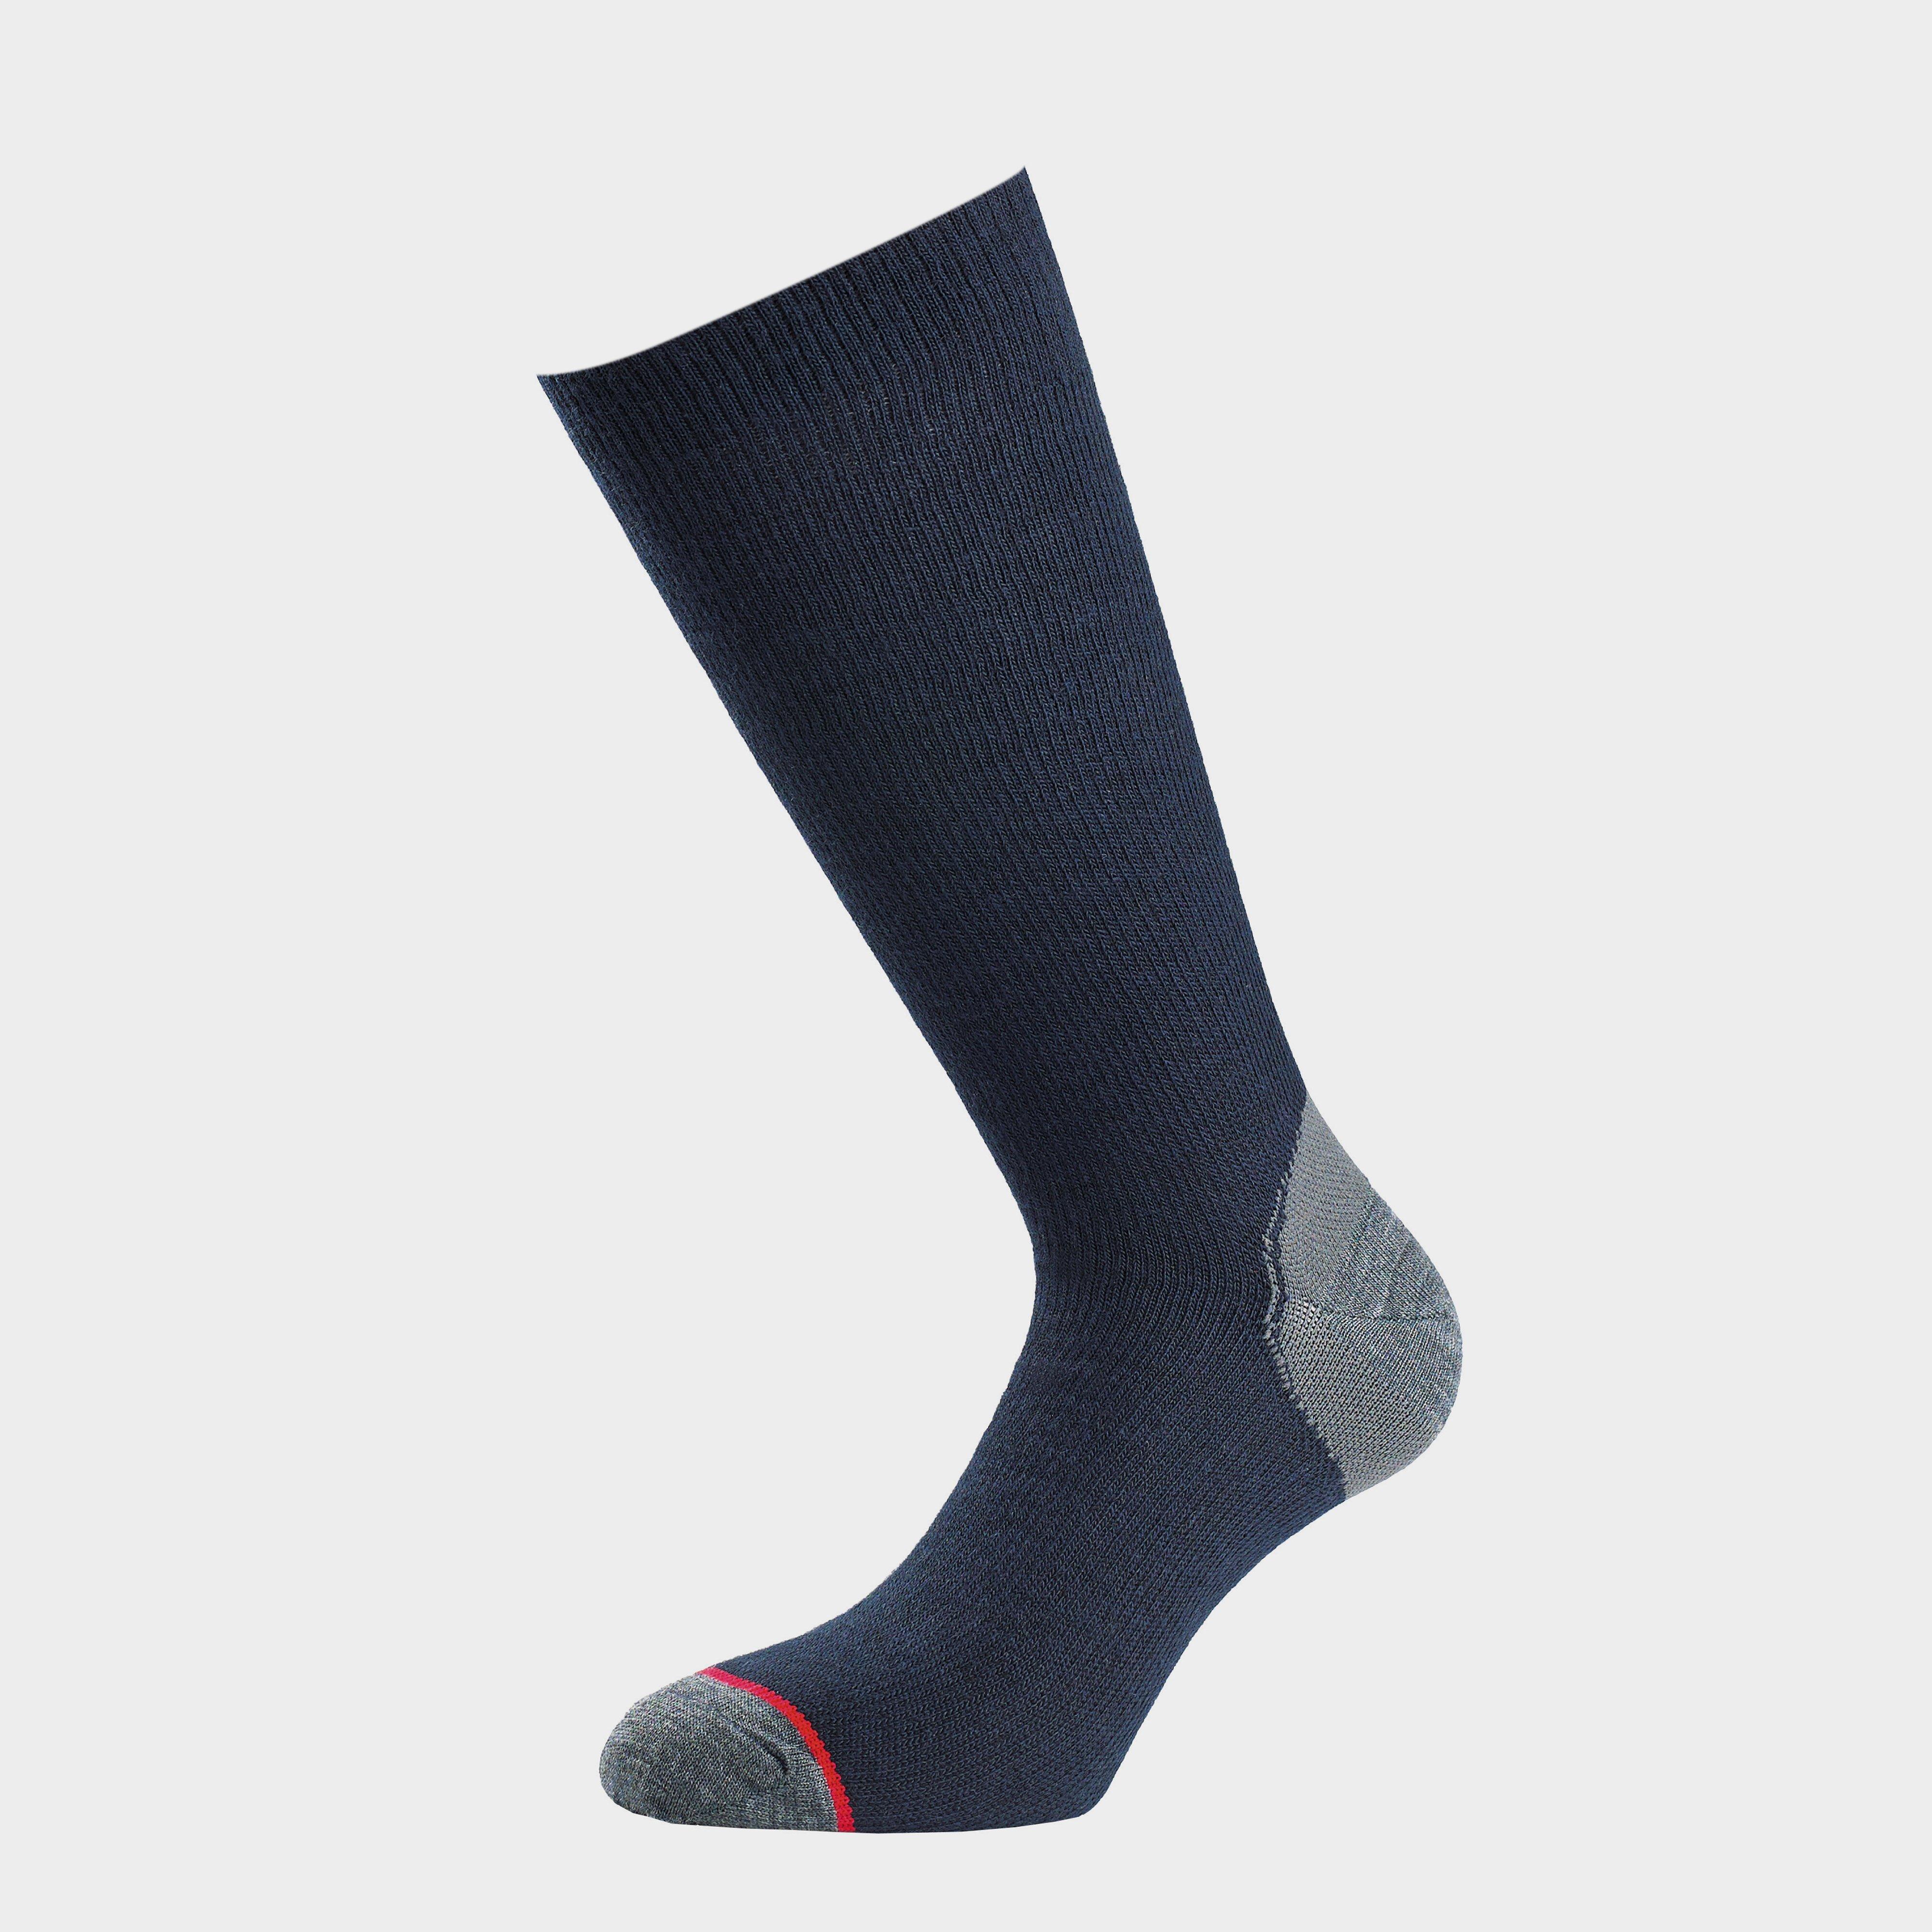 Image of 1000 Mile Men's Ultimate Lightweight Walking Socks, Black